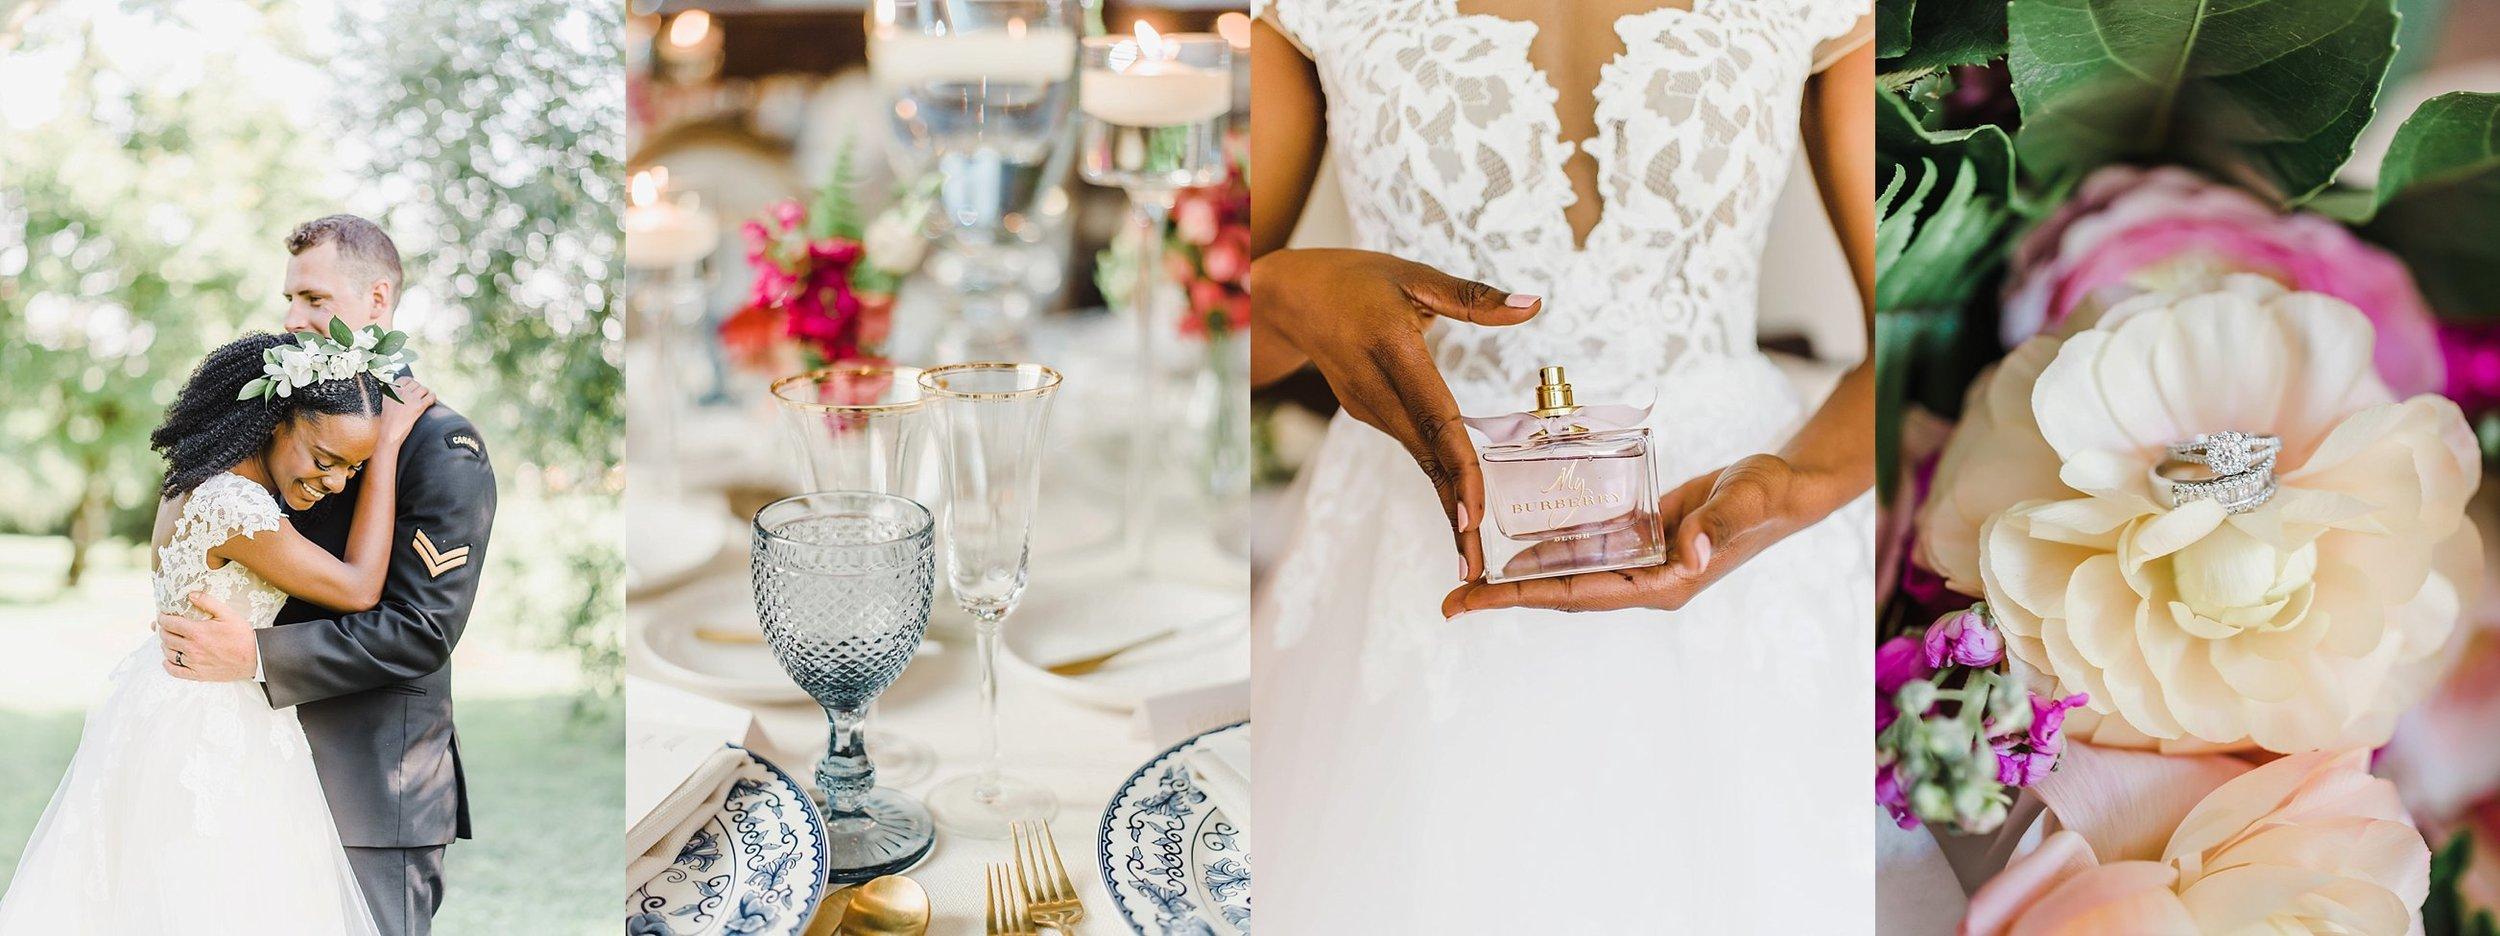 light airy indie fine art ottawa wedding photographer | Ali and Batoul Photography_1053.jpg